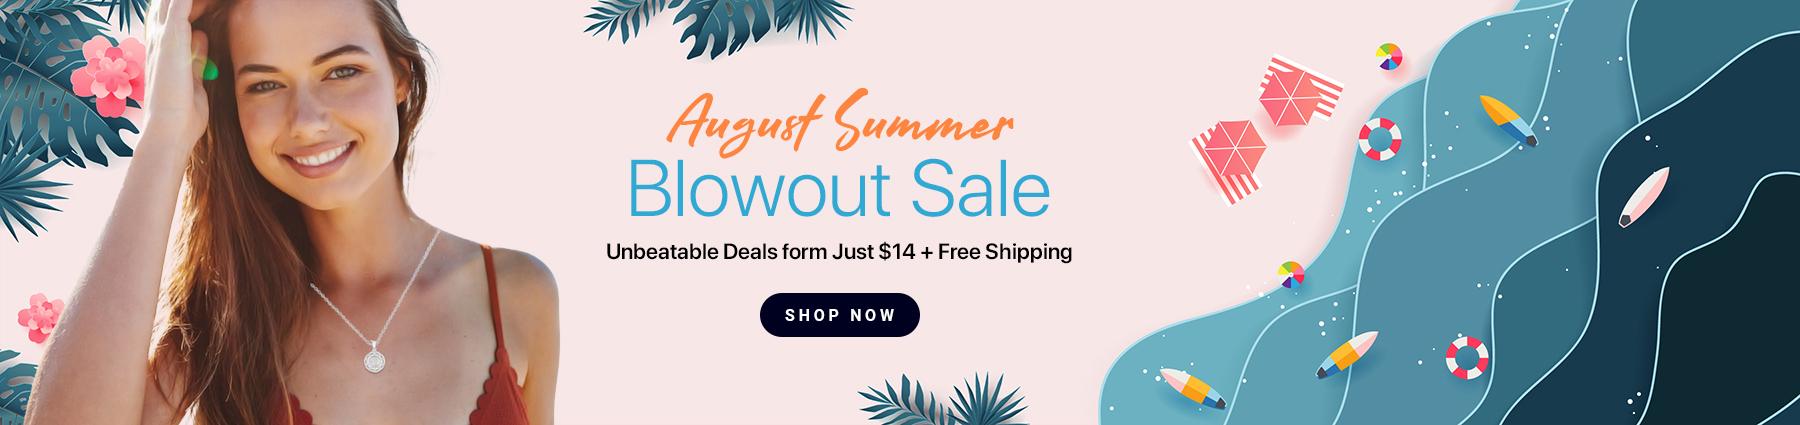 August Summer Blowout Sale